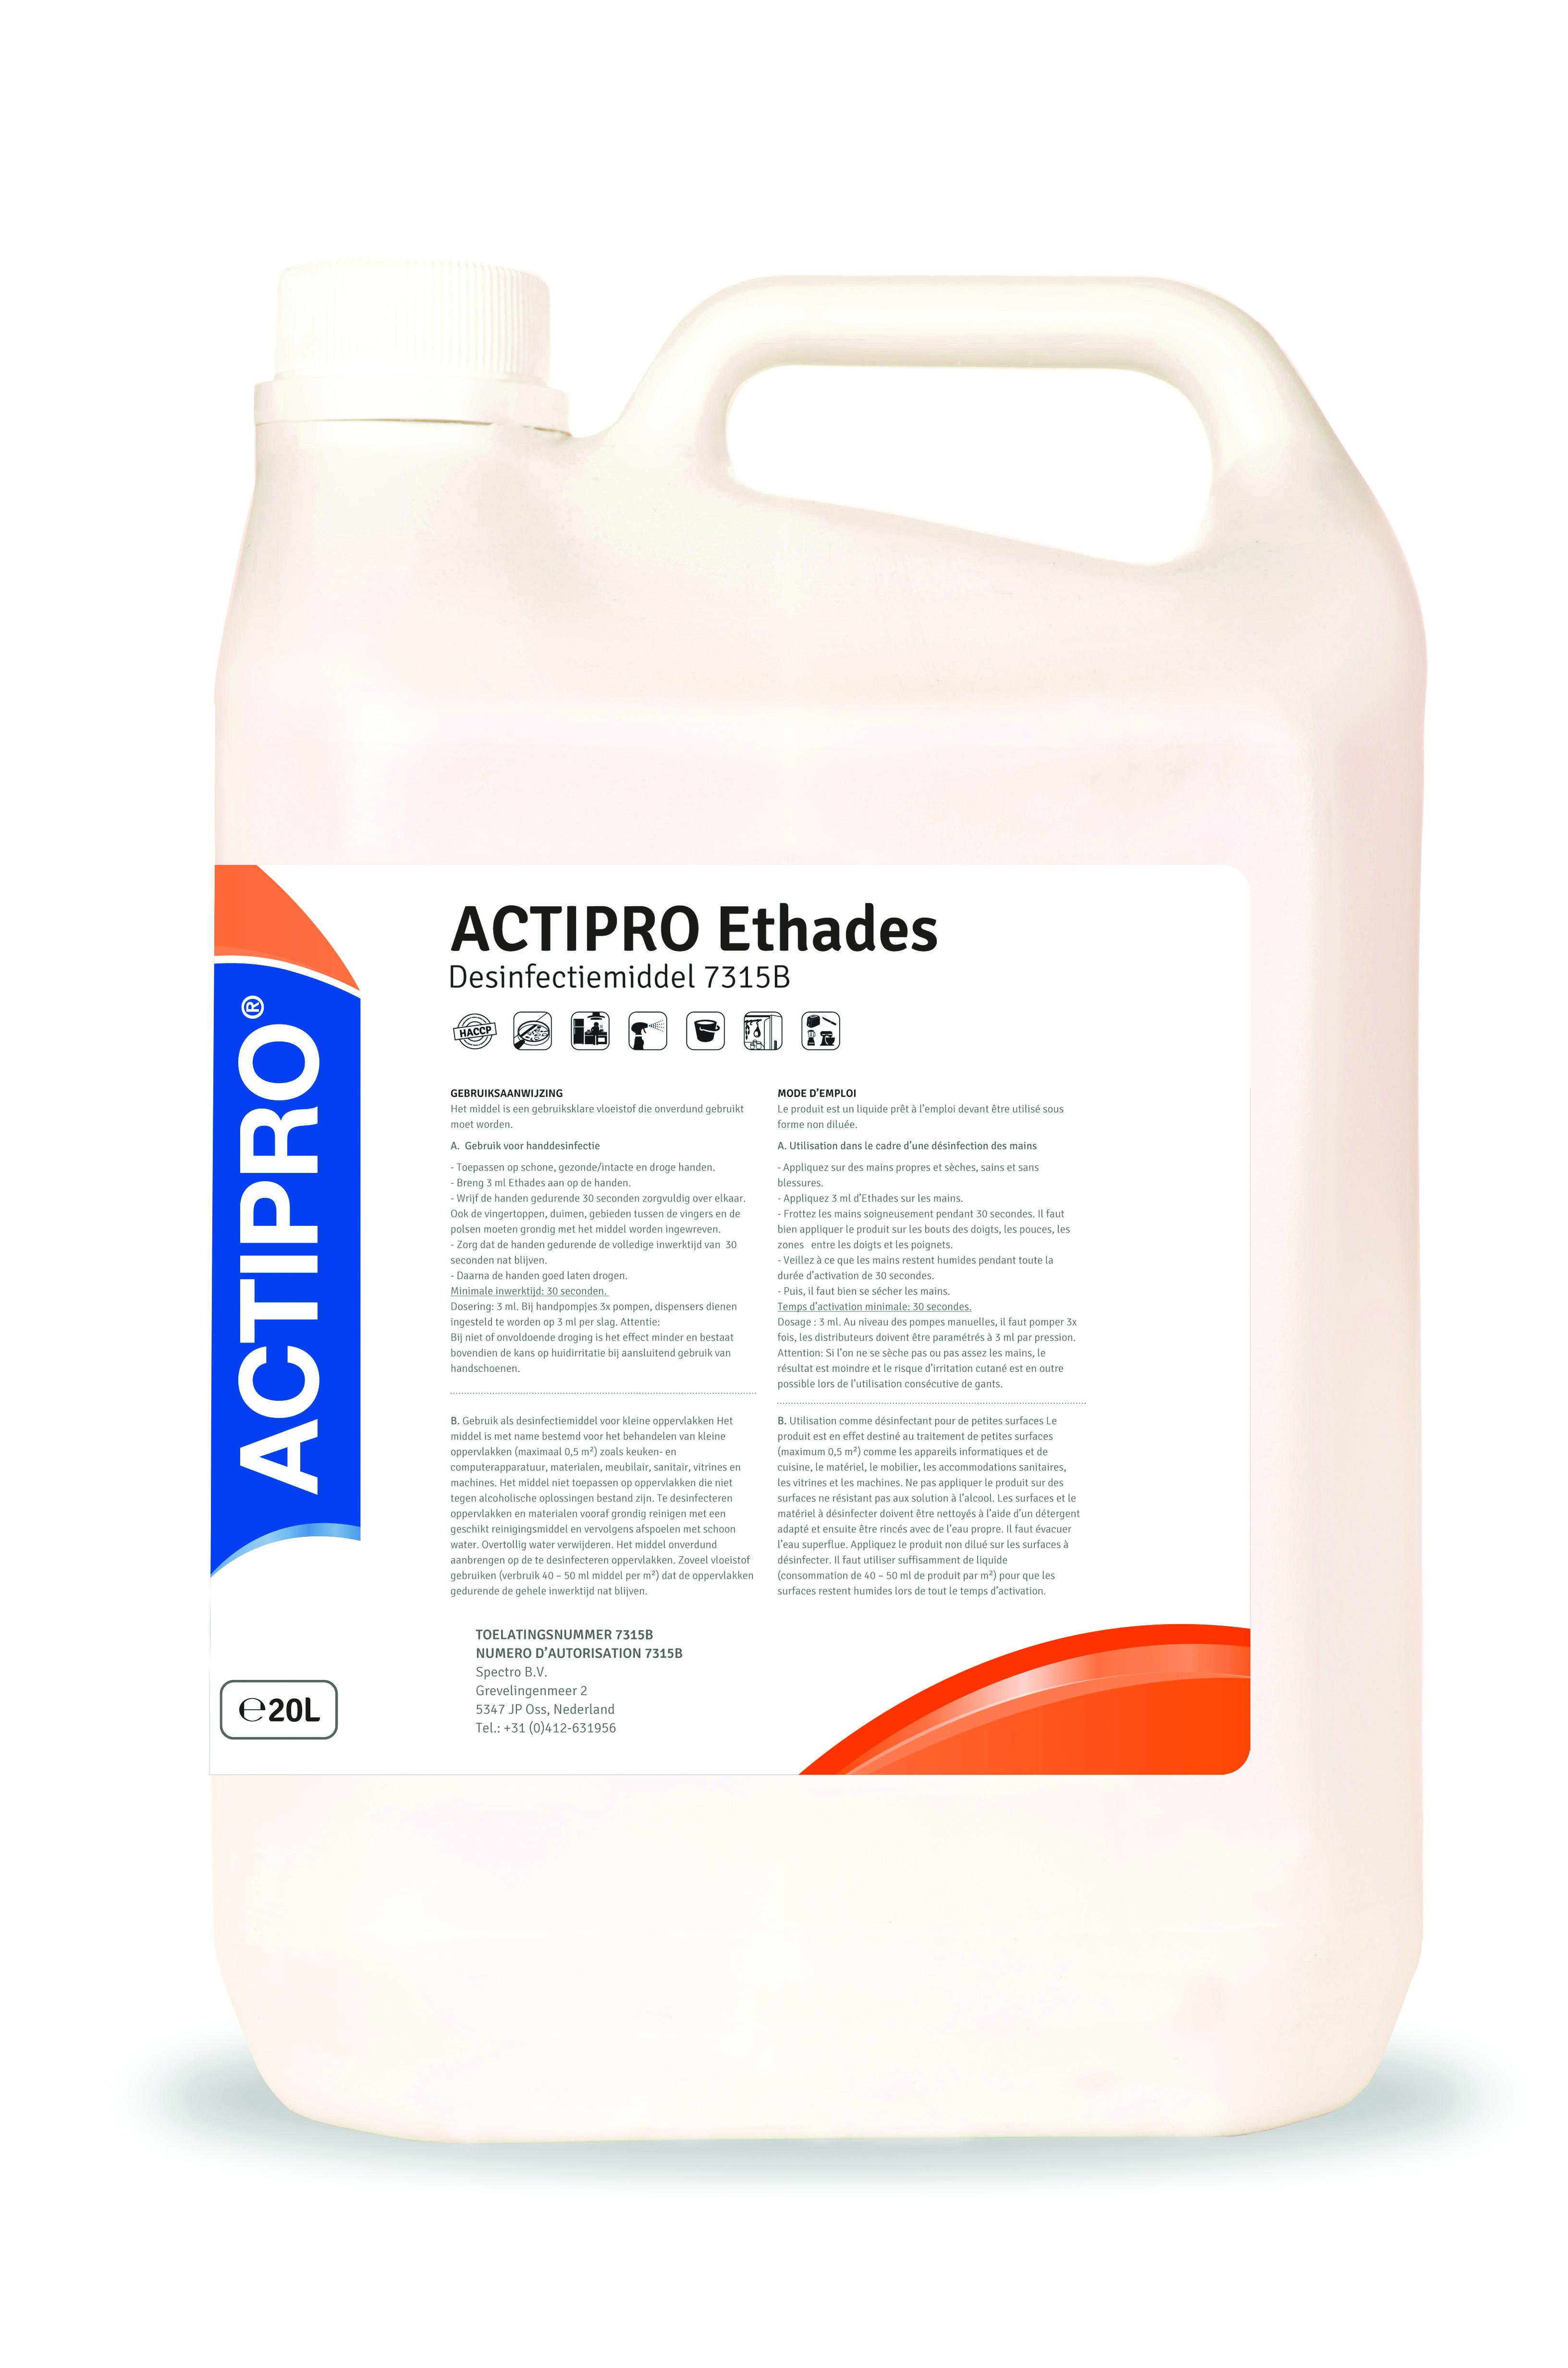 ACTIPRO Ethades 7315B